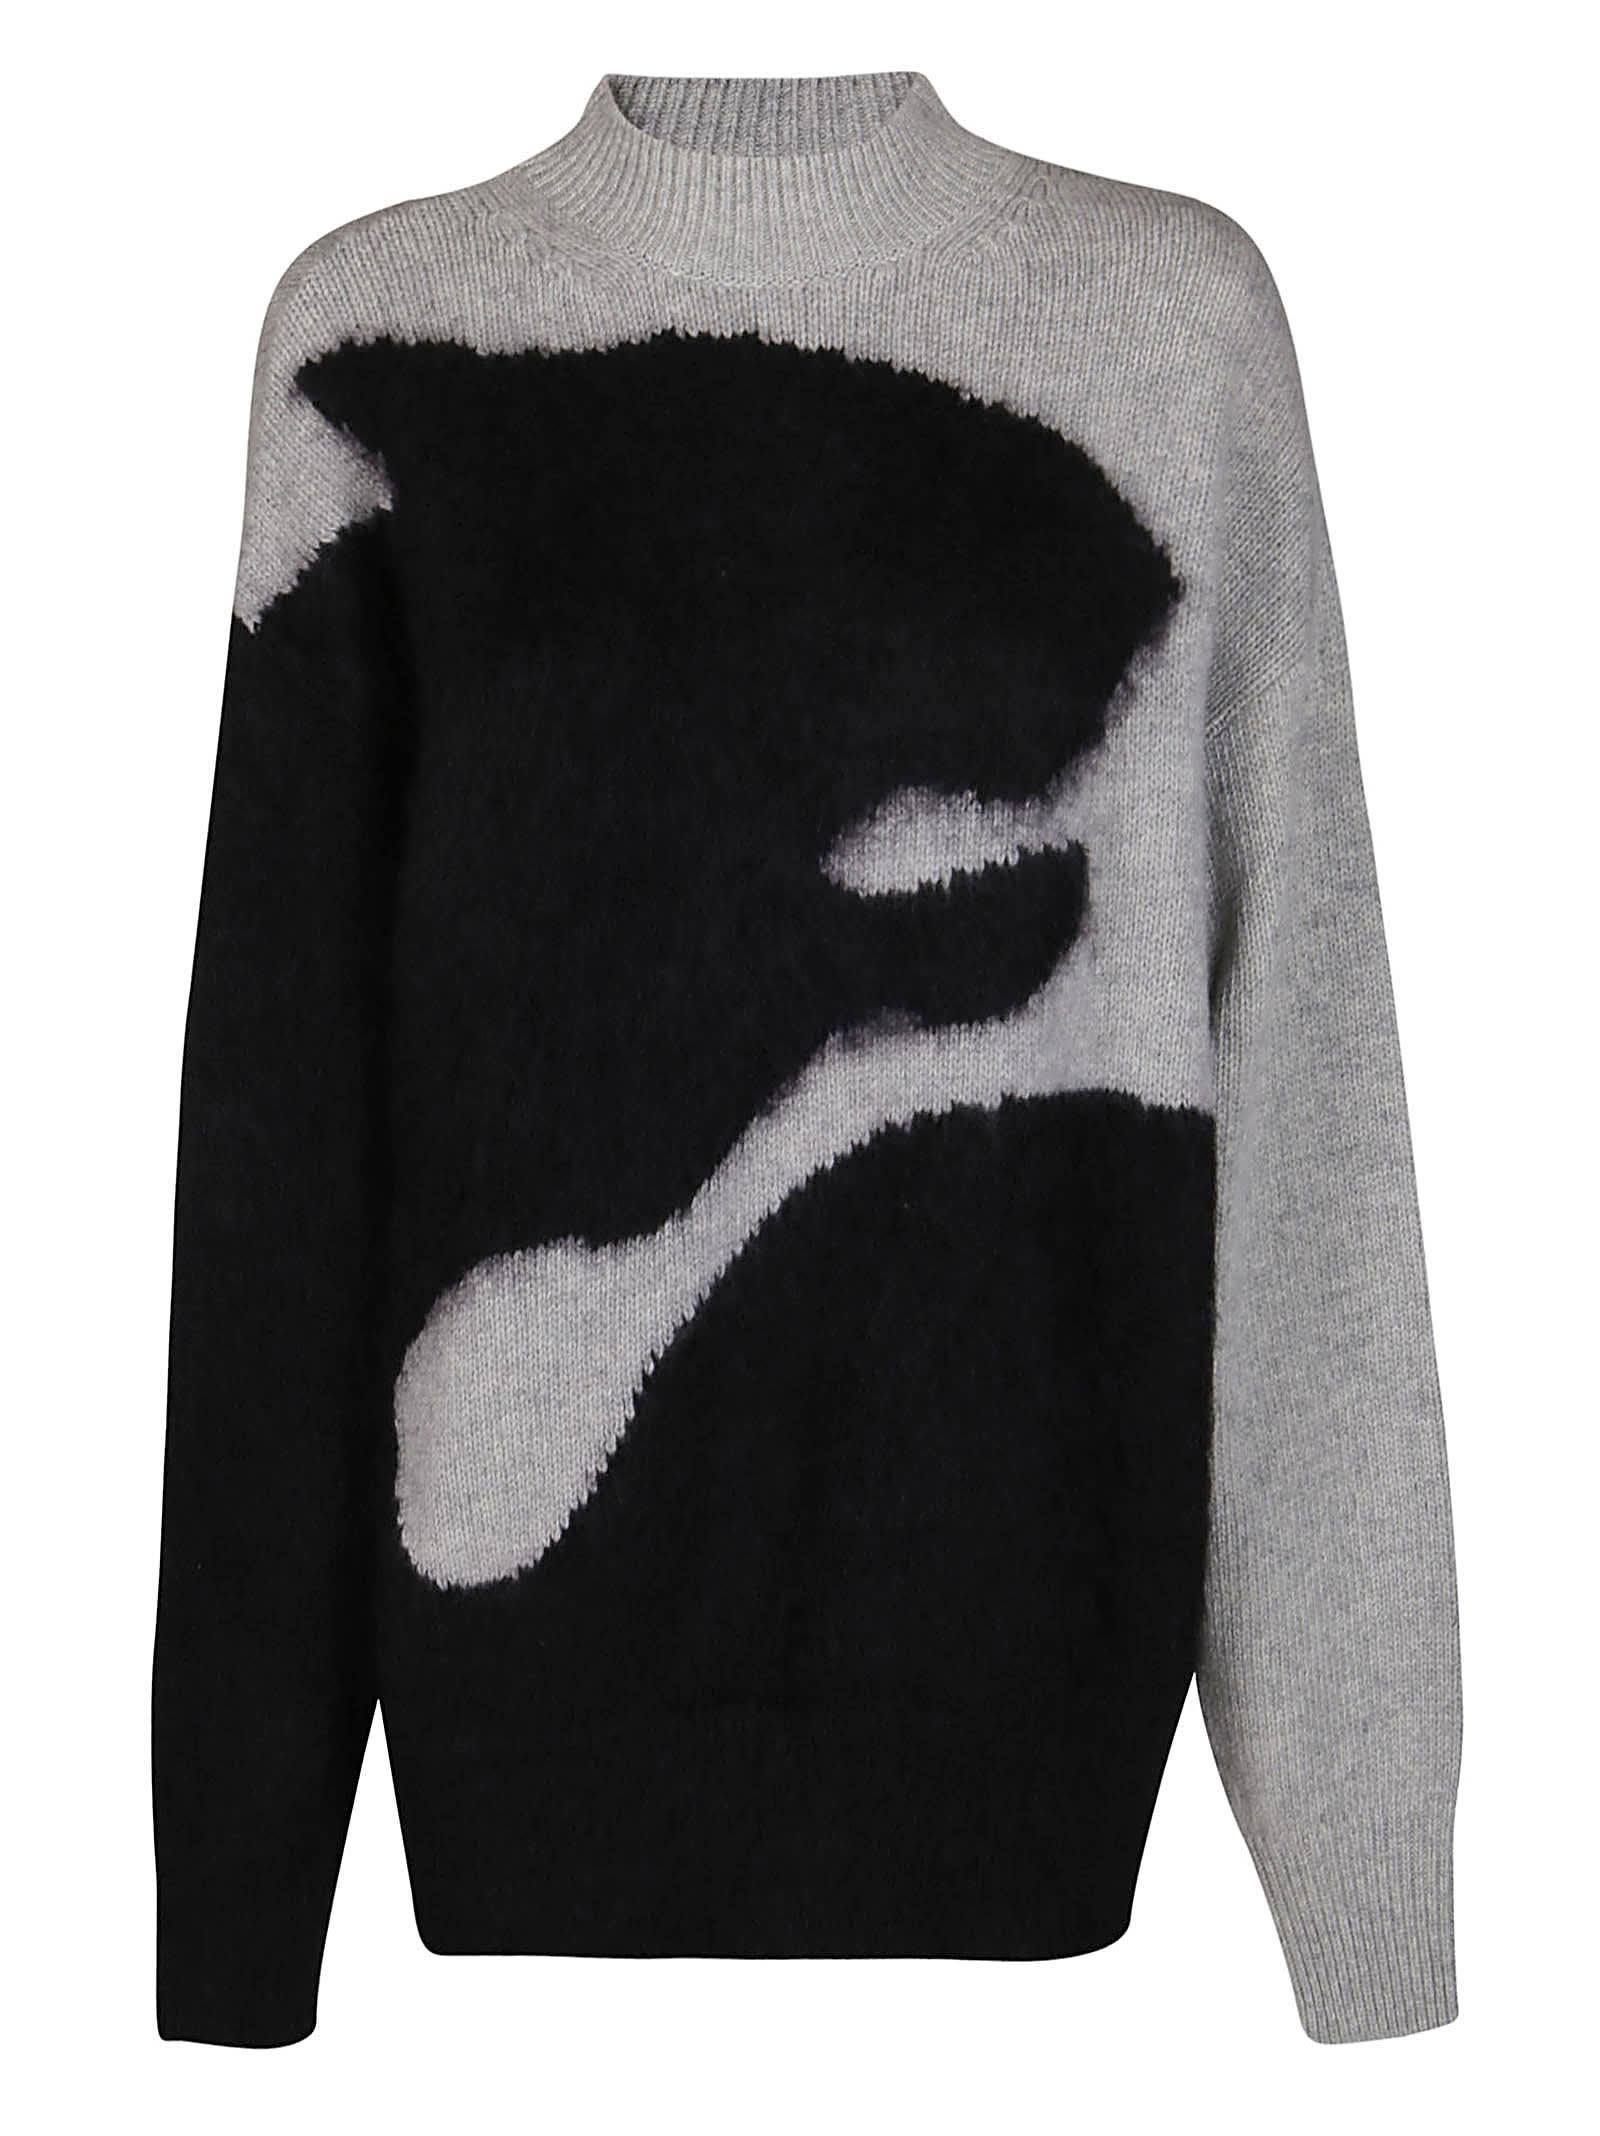 Kenzo Black And Grey Mohair-wool Blend Jumper